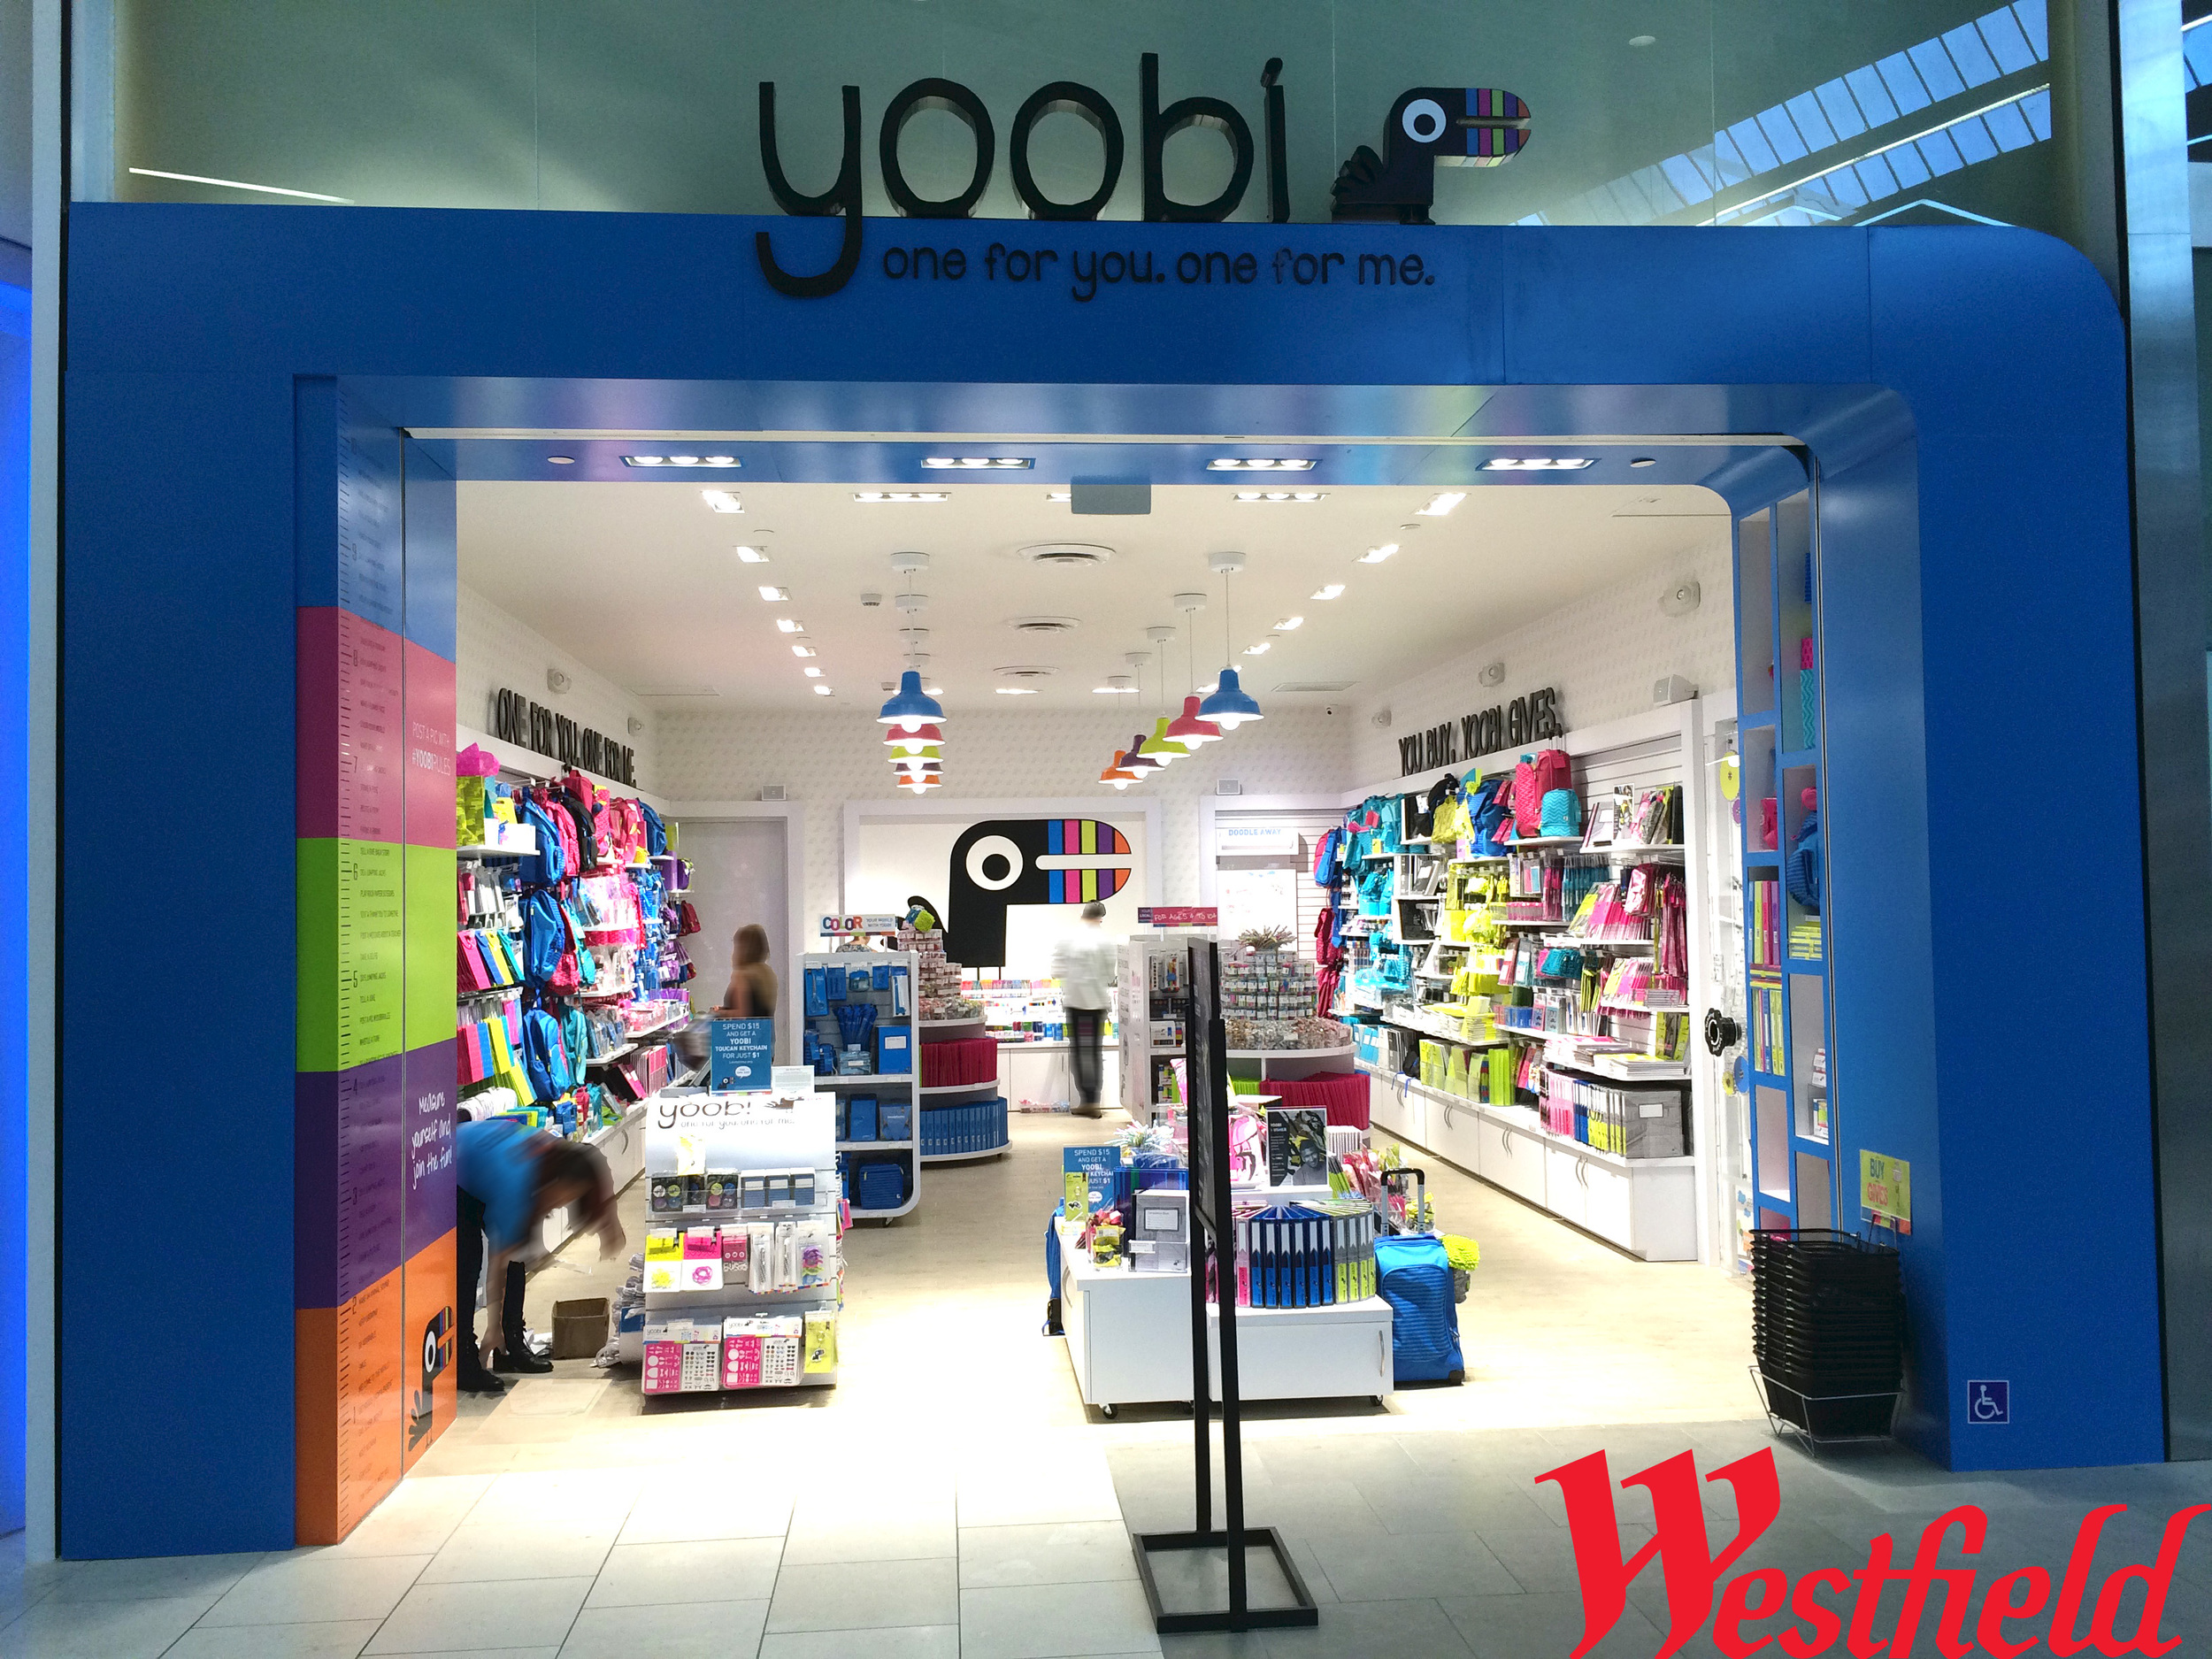 Yoobi Storefront02.jpg